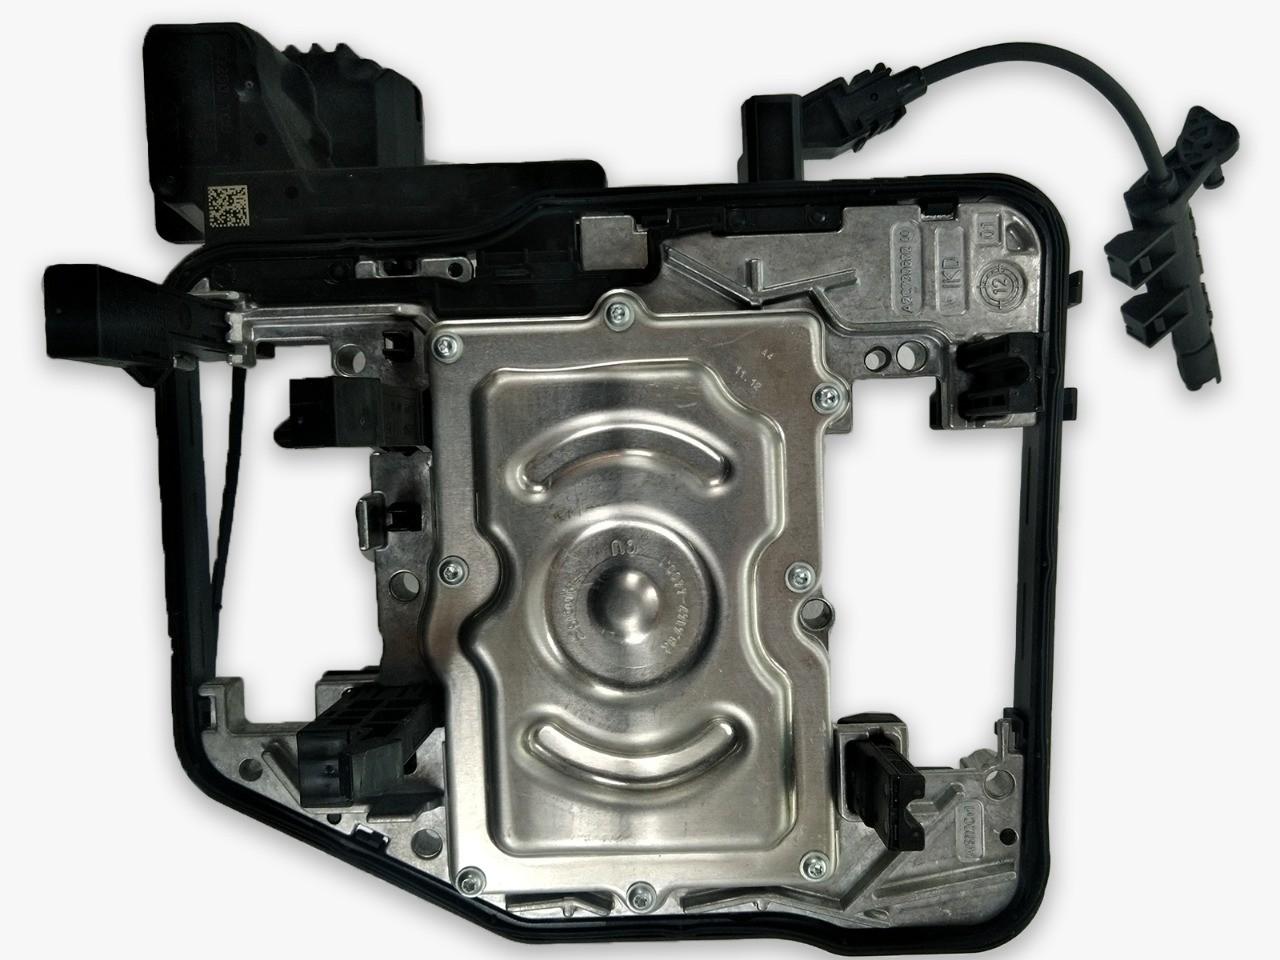 Placa Mecatrônica Letra D Câmbio Dsg Automático Dq200 Volkswagen Audi